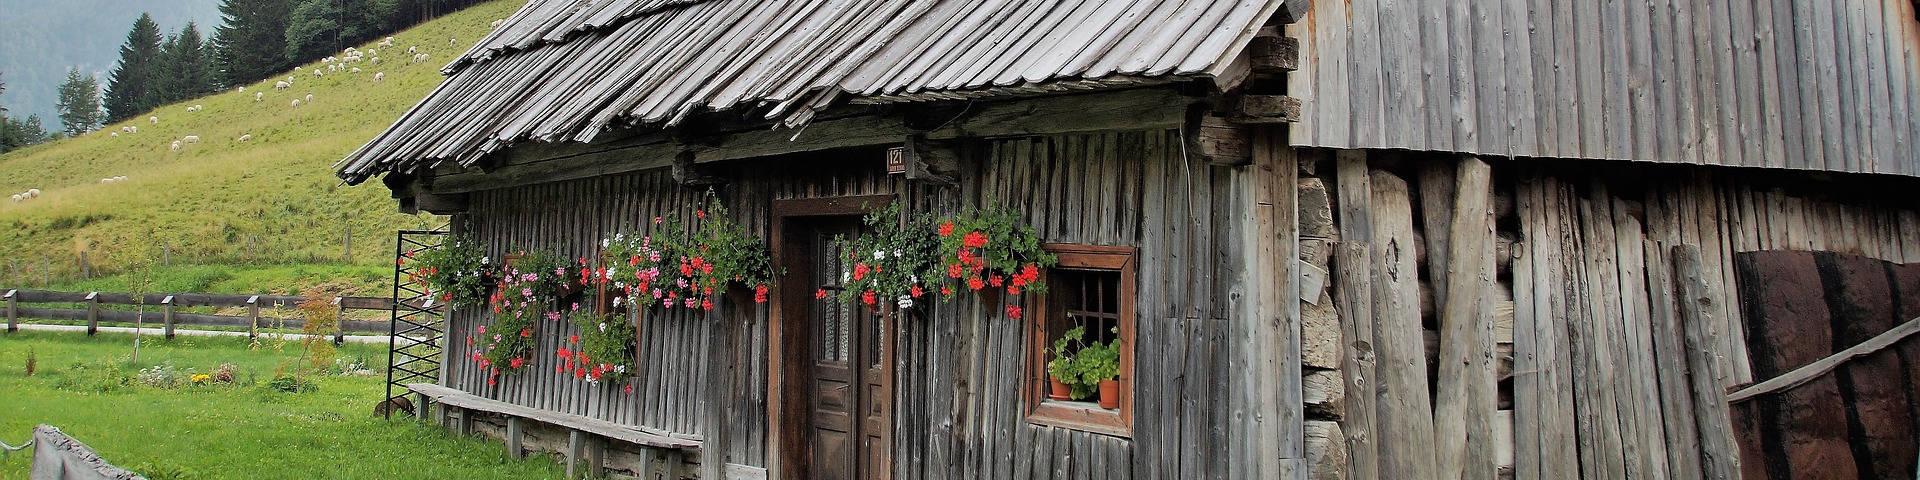 jezersko-2581116_1920 - Bild von ivabalk